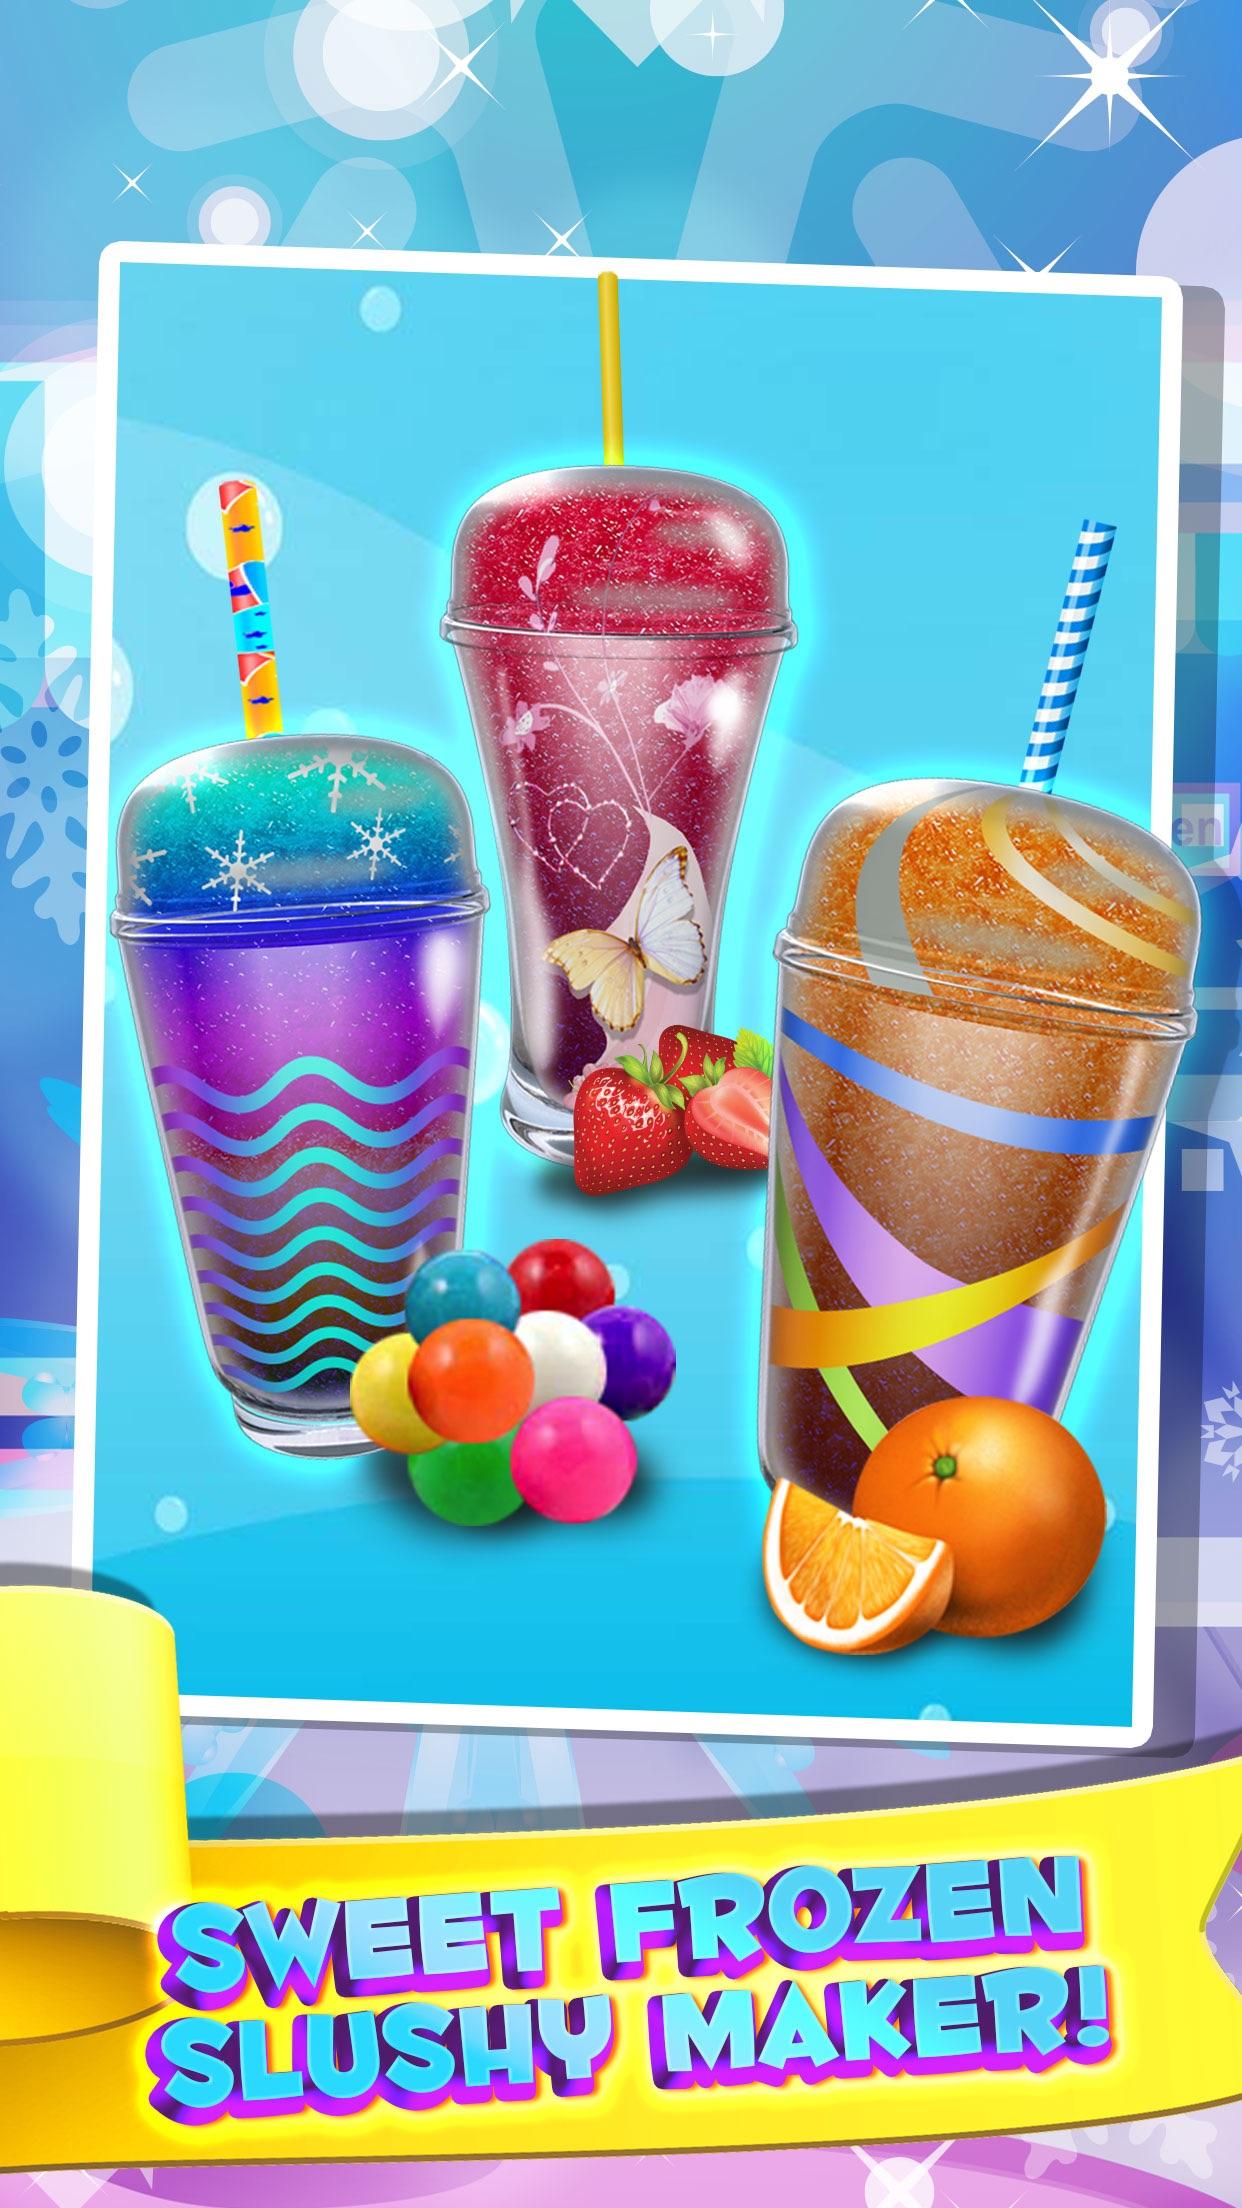 Dessert Slushy Maker Food Cooking Game - make candy drink for ice cream soda making salon! Screenshot